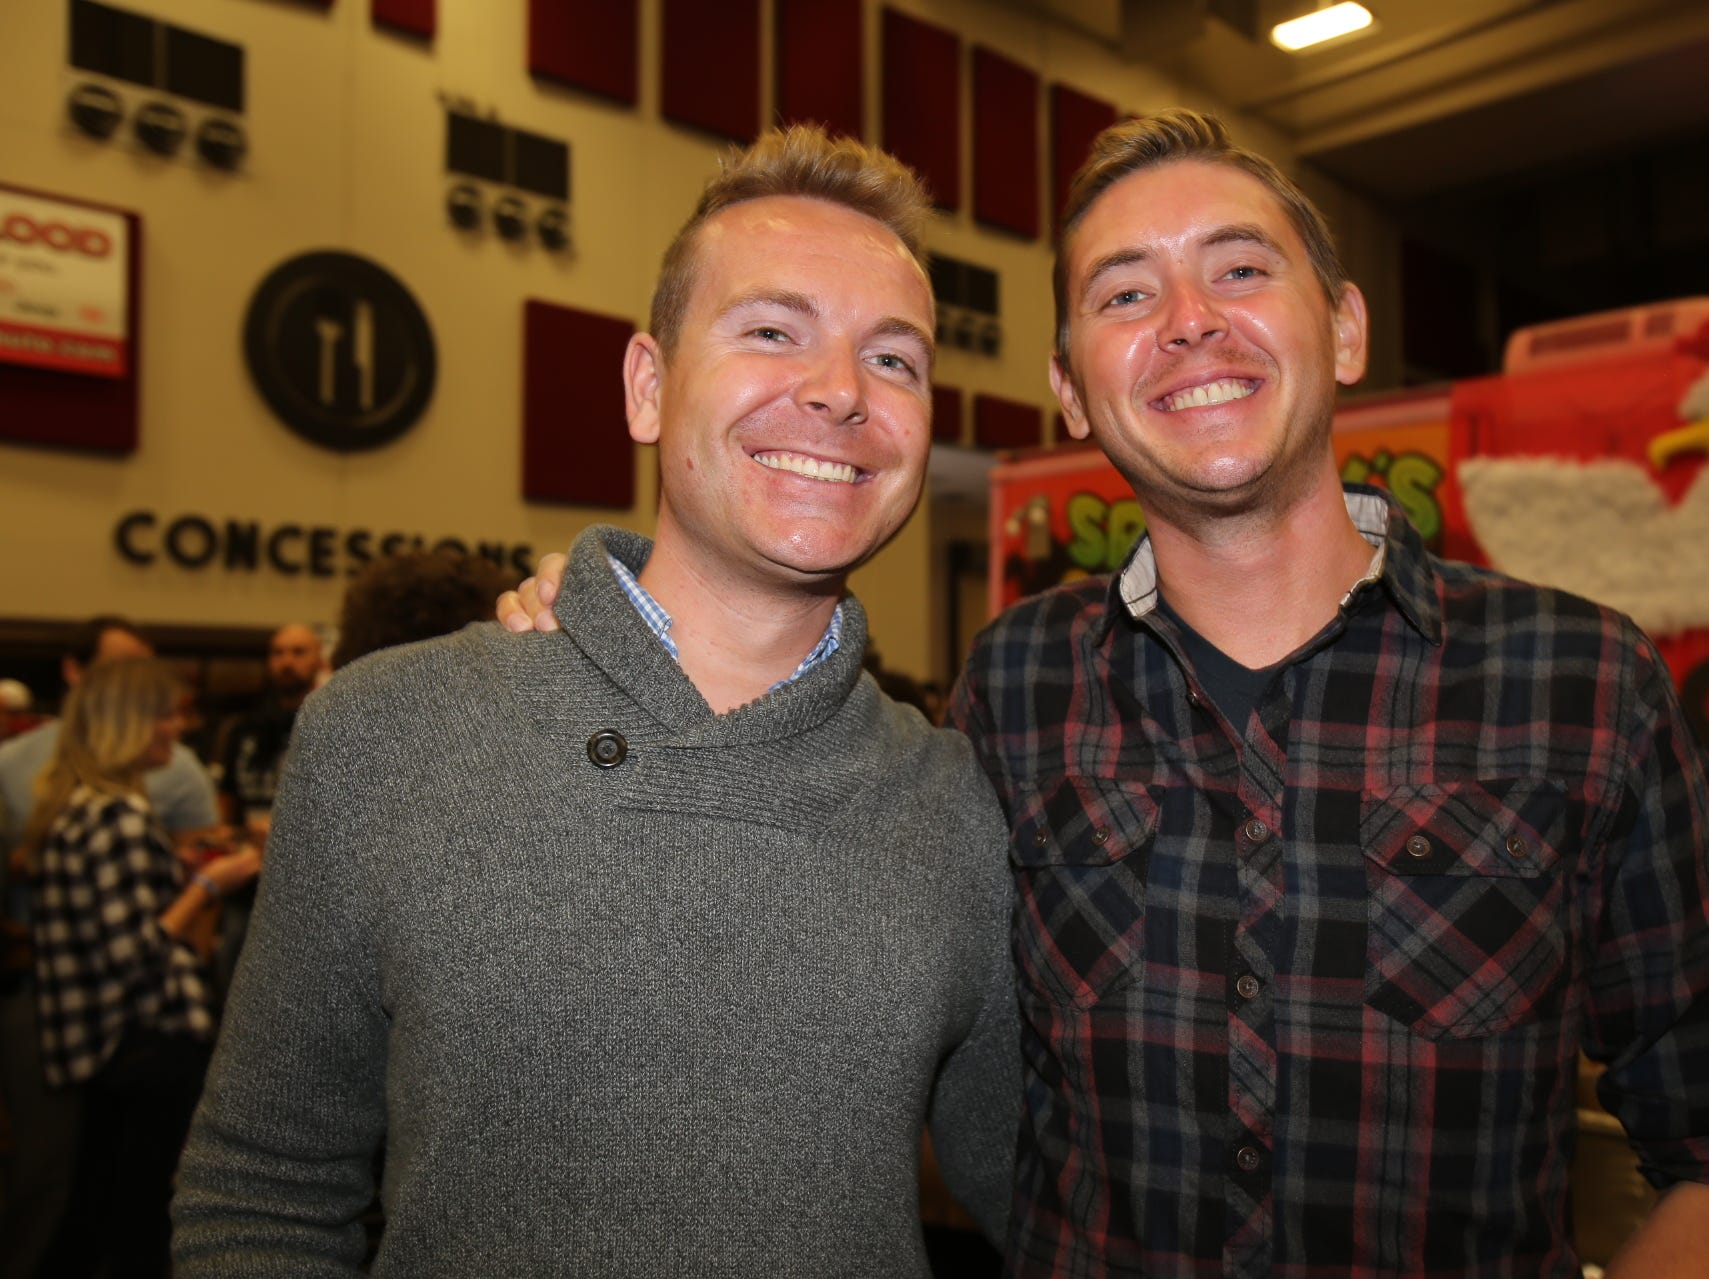 Dustin Beasley and Sean Barnhill